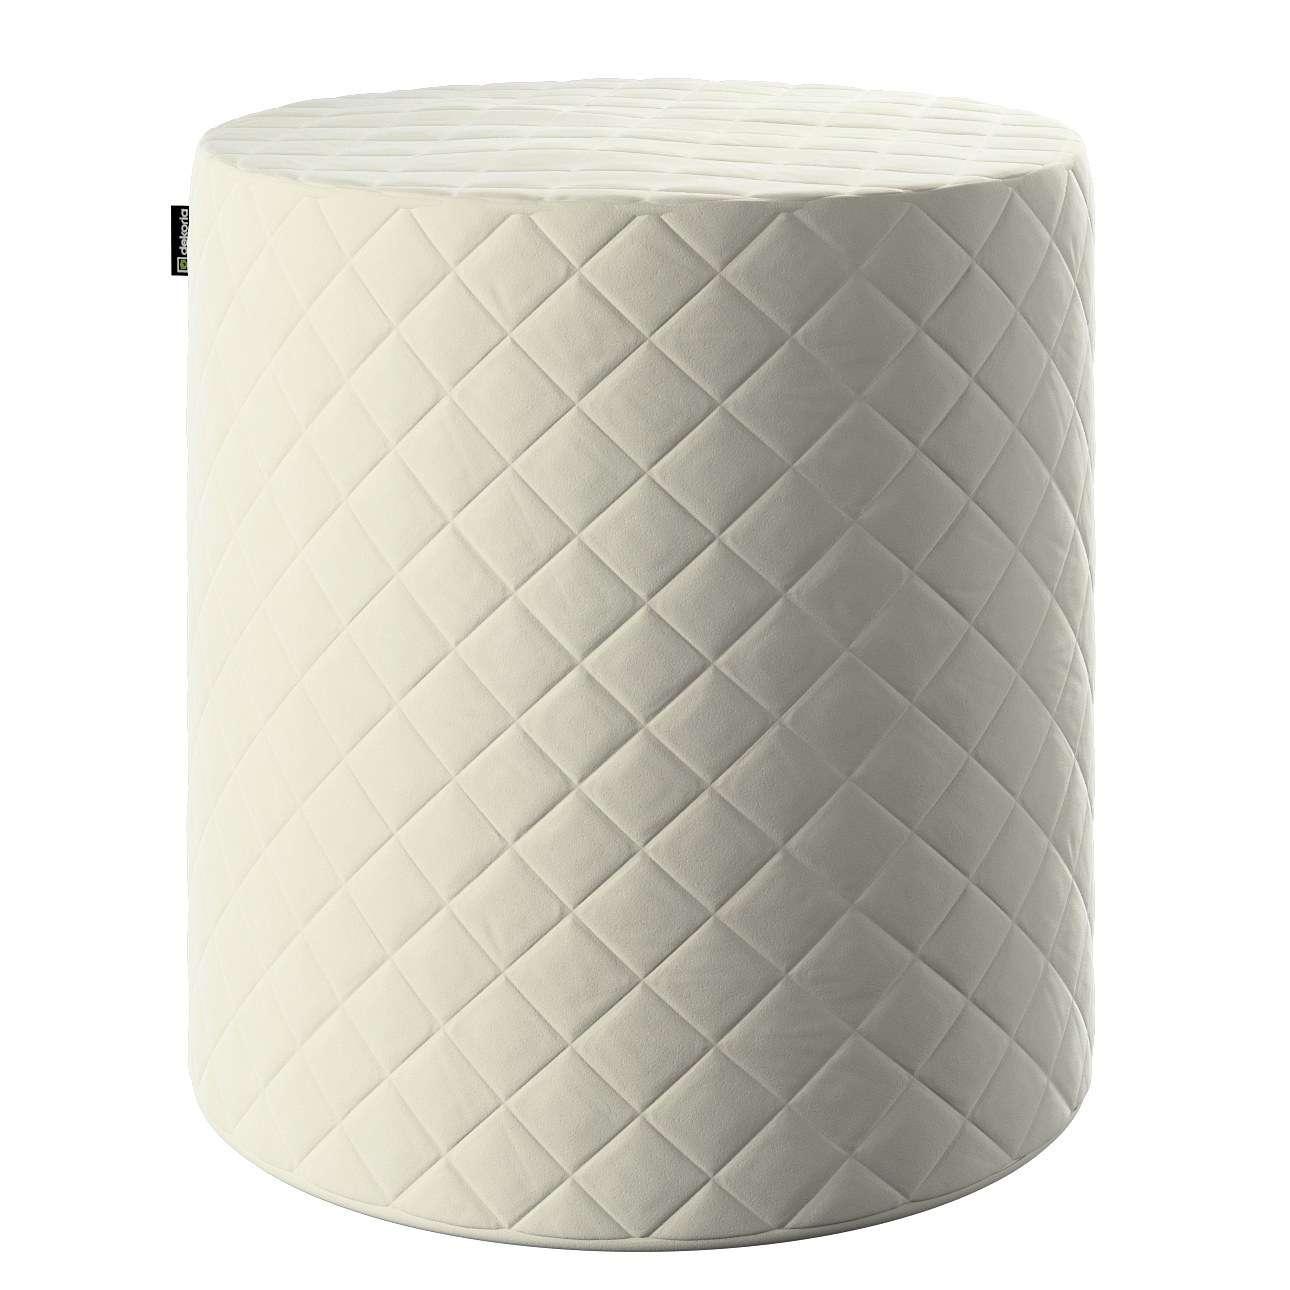 Puf Barrel pikowany w kolekcji Velvet, tkanina: 704-10